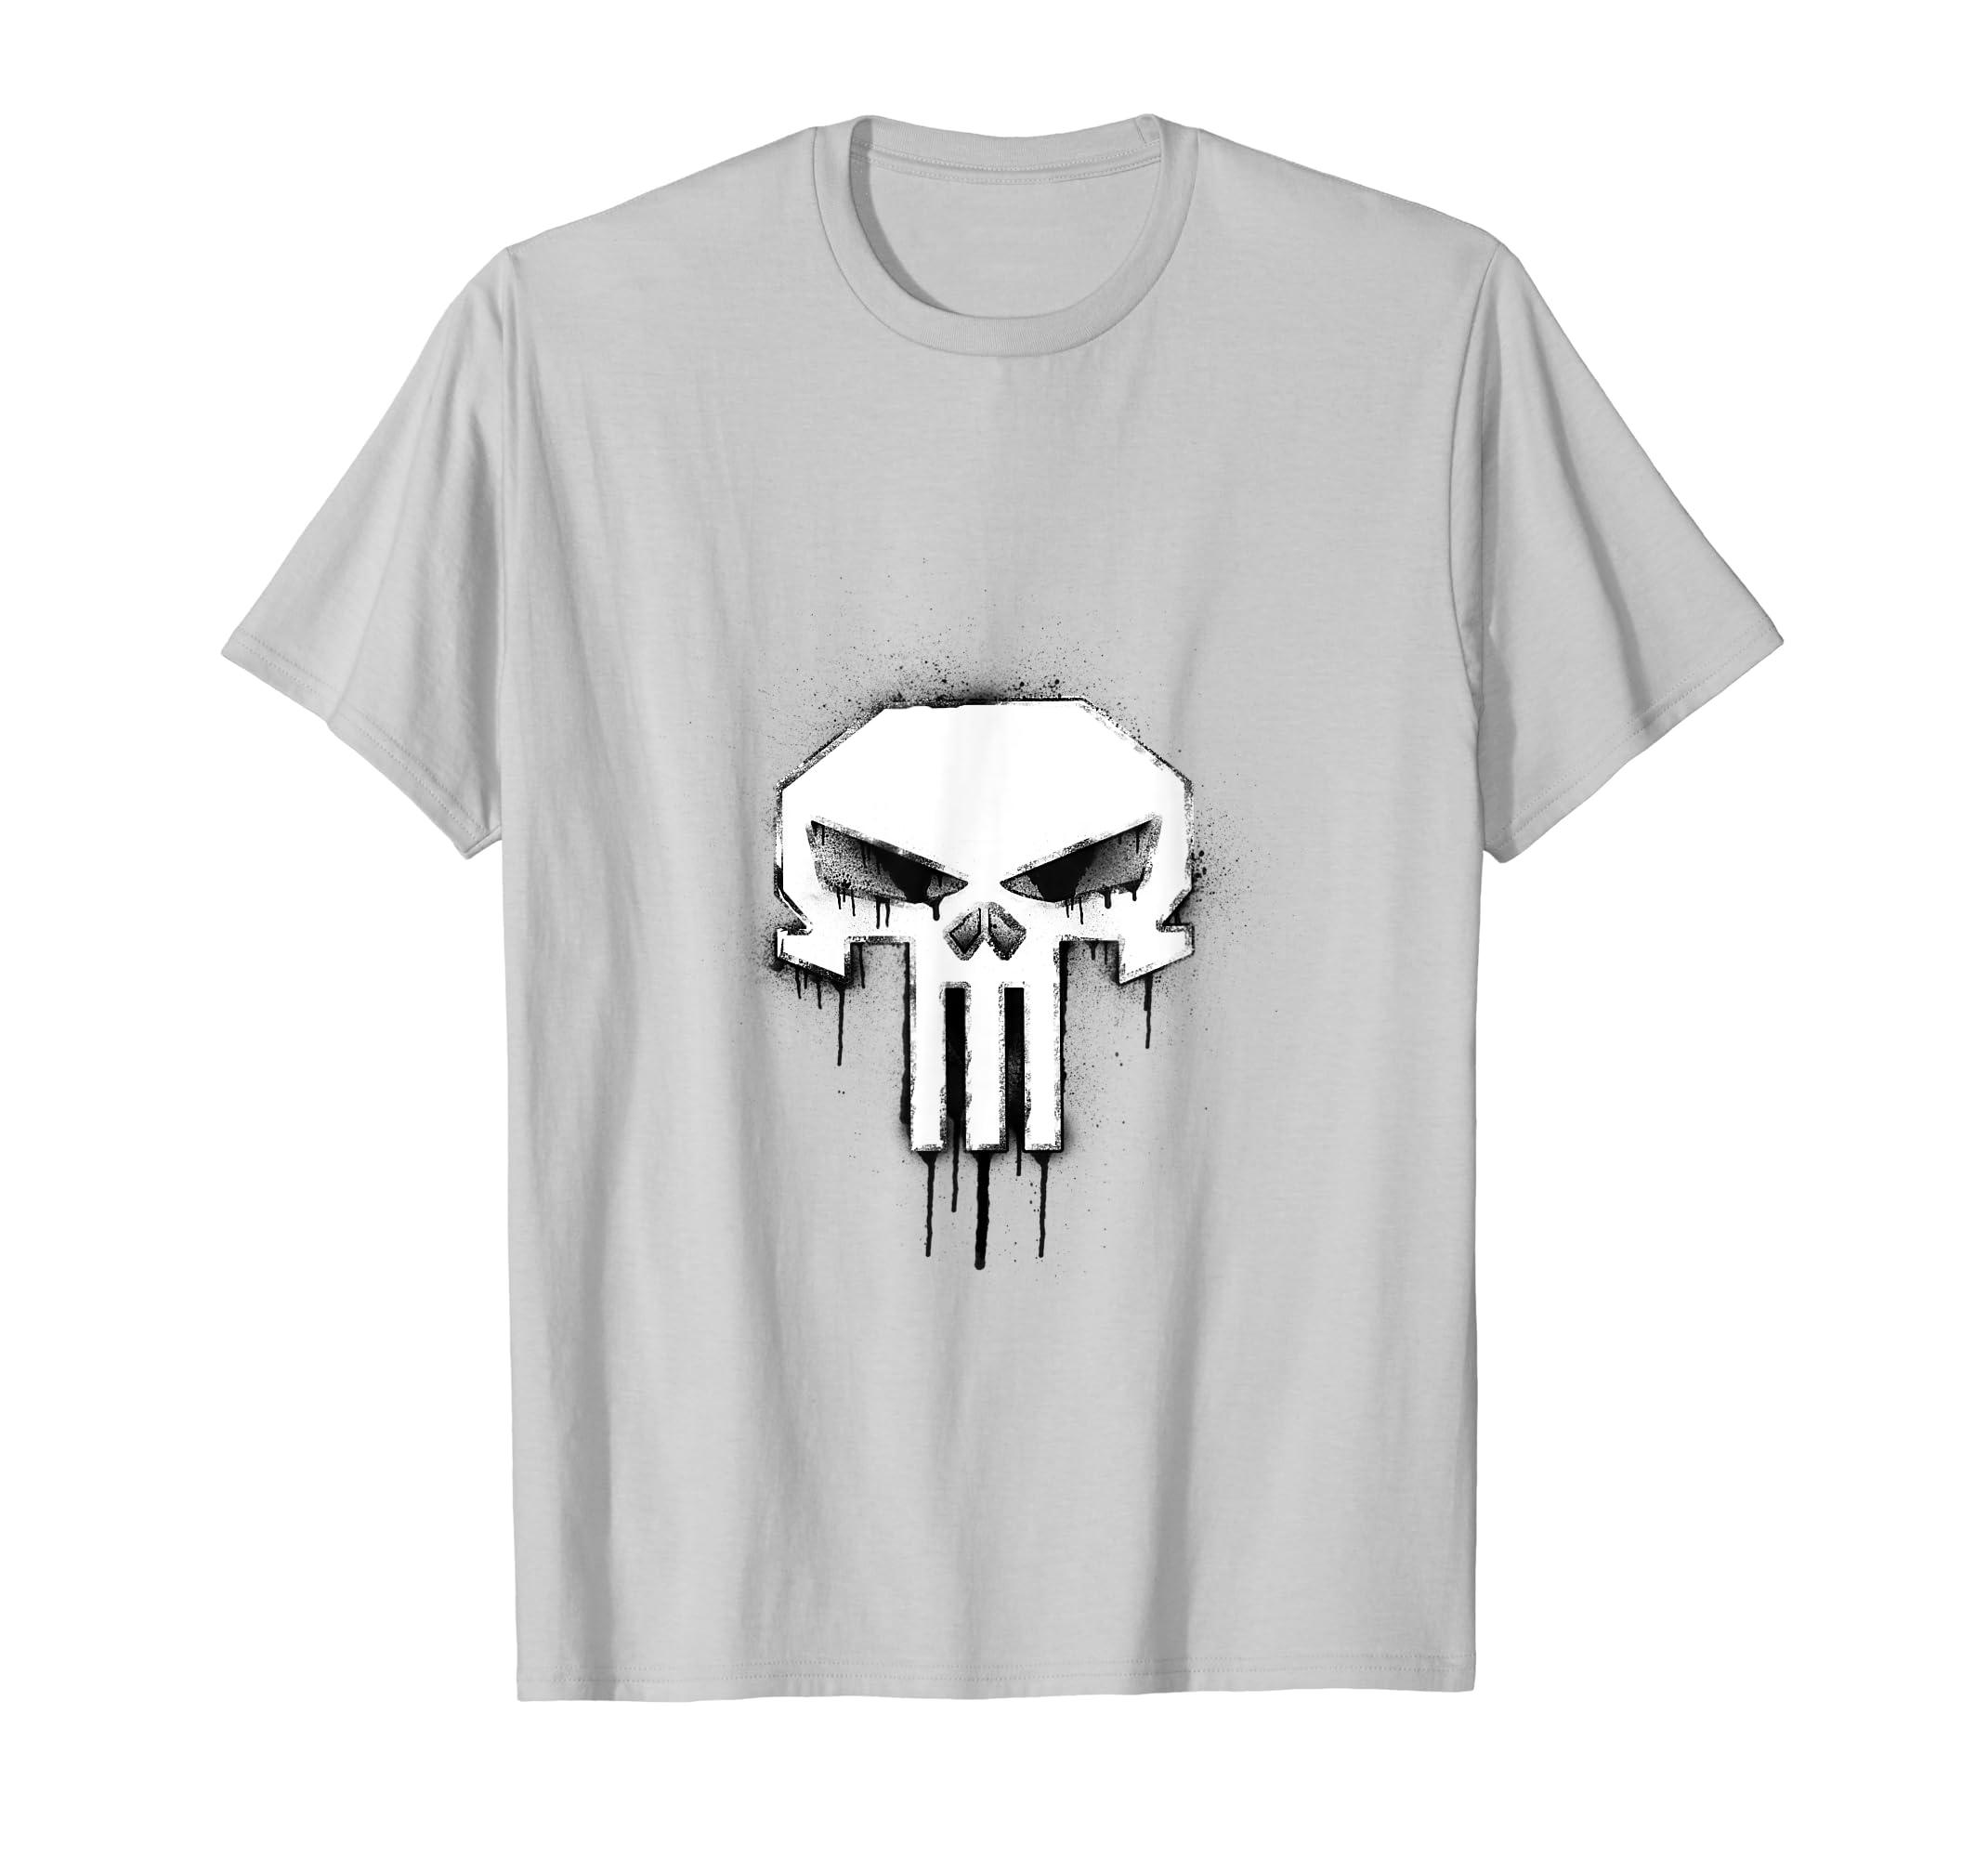 126a472ce Amazon.com: Marvel The Punisher Skull Logo Dripping Spray Paint T-Shirt:  Clothing